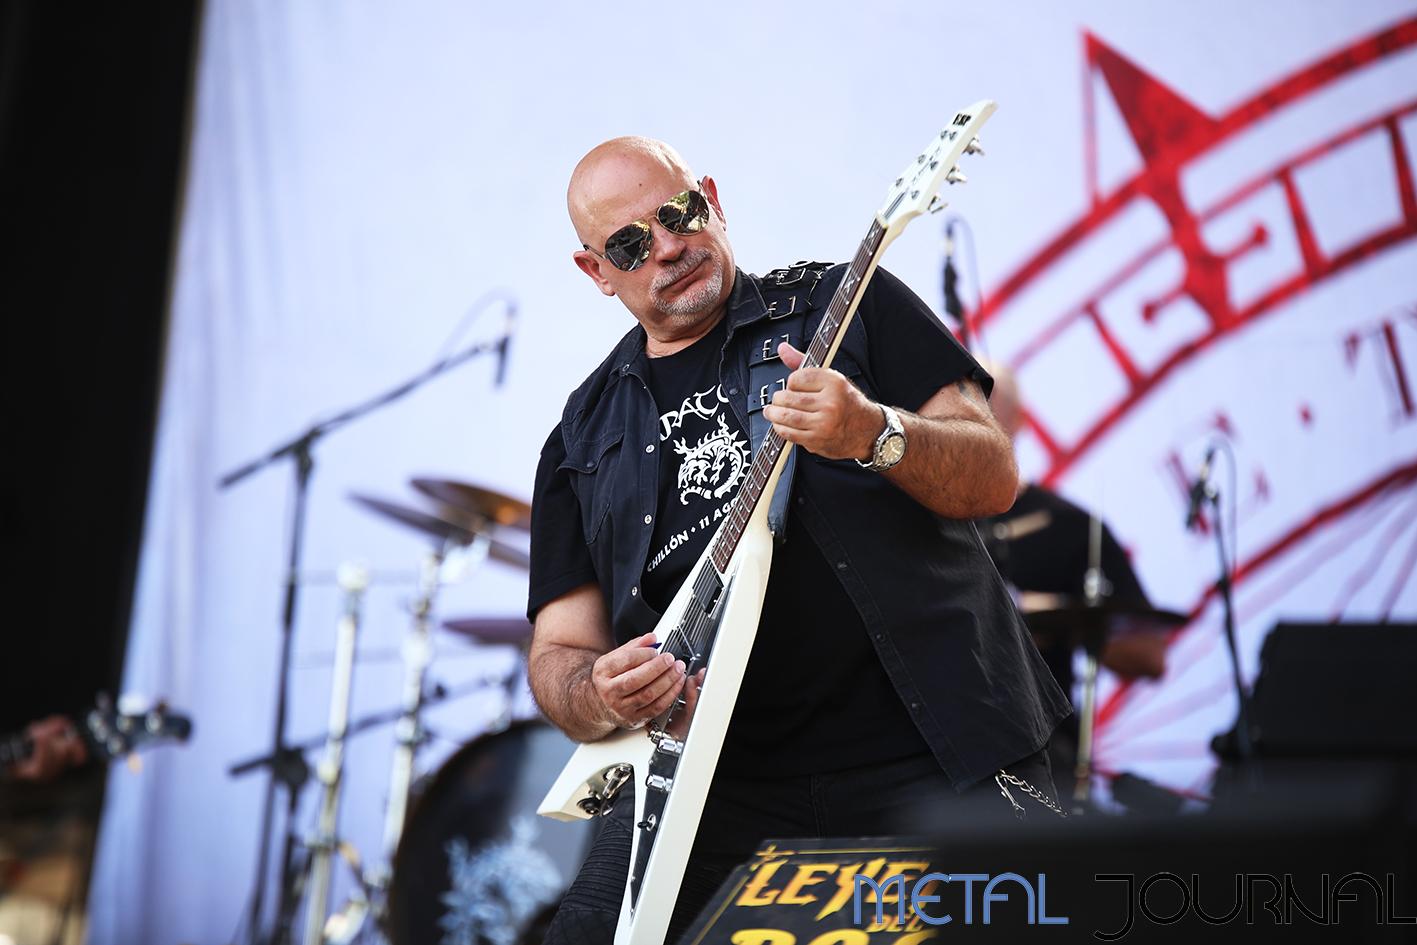 saratoga - leyendas del rock 2019 metal journal pic 2